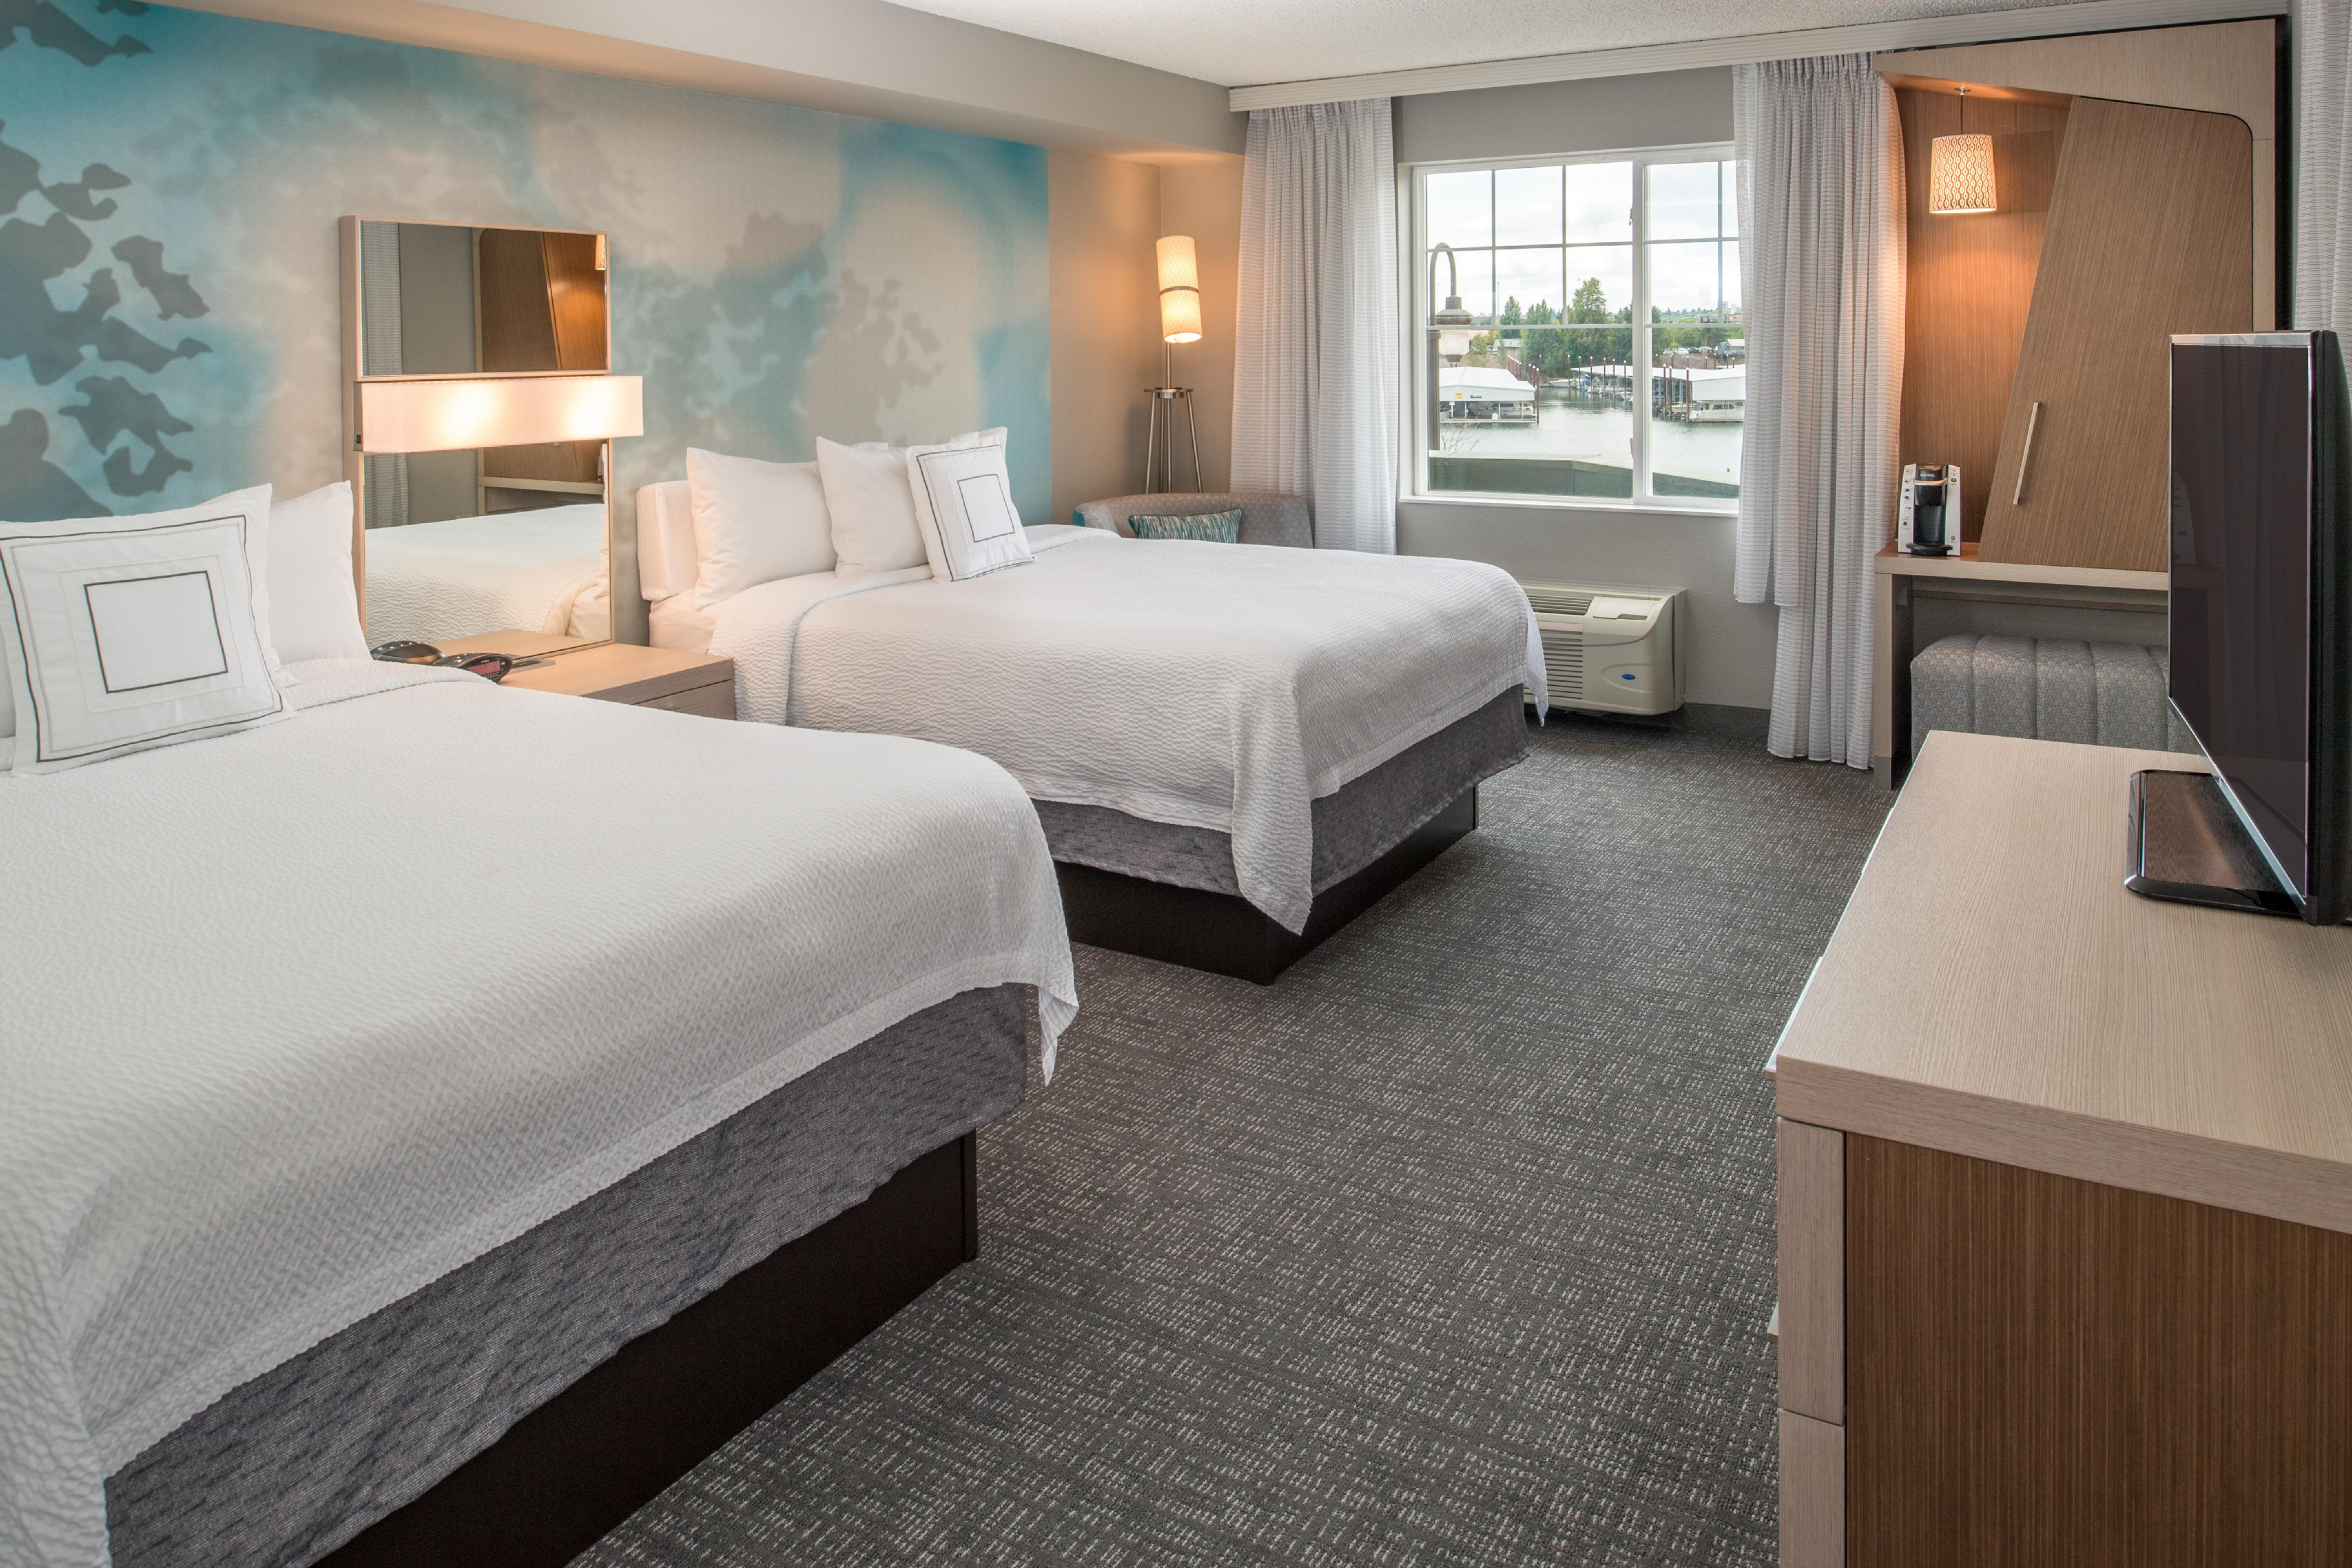 Portland harbor hotel discount code : Vinyl mp3 player